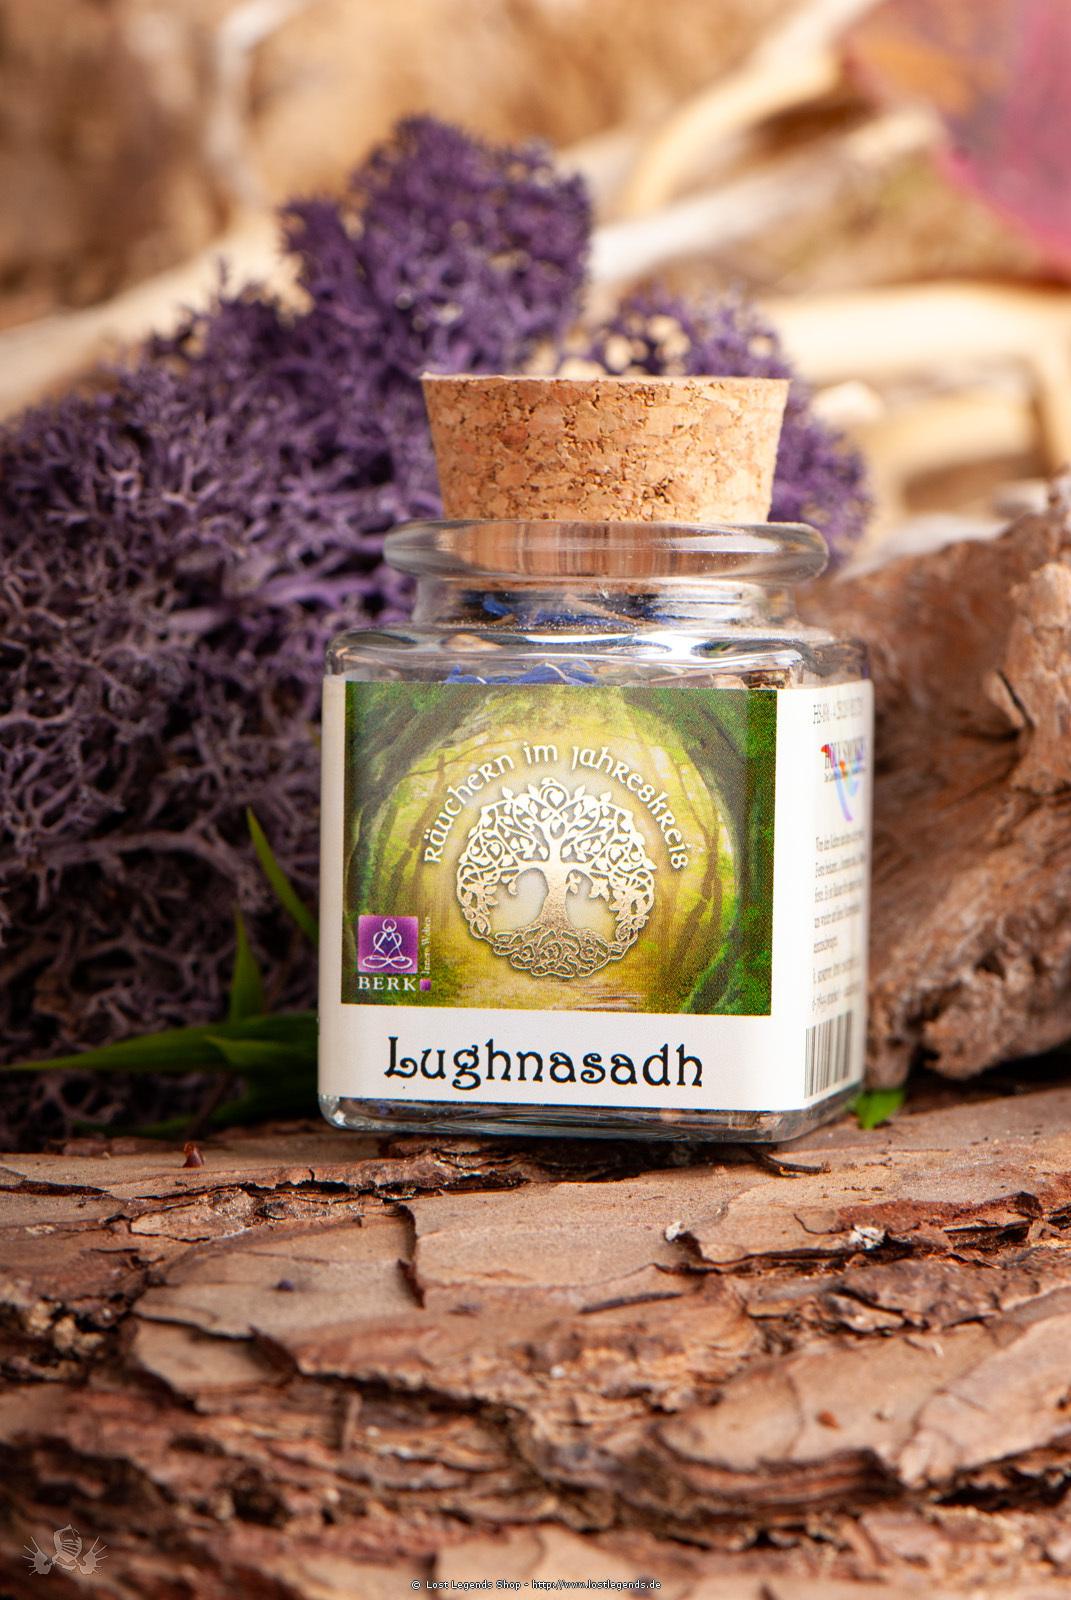 Lughnasadh Räuchermischung, 50 ml